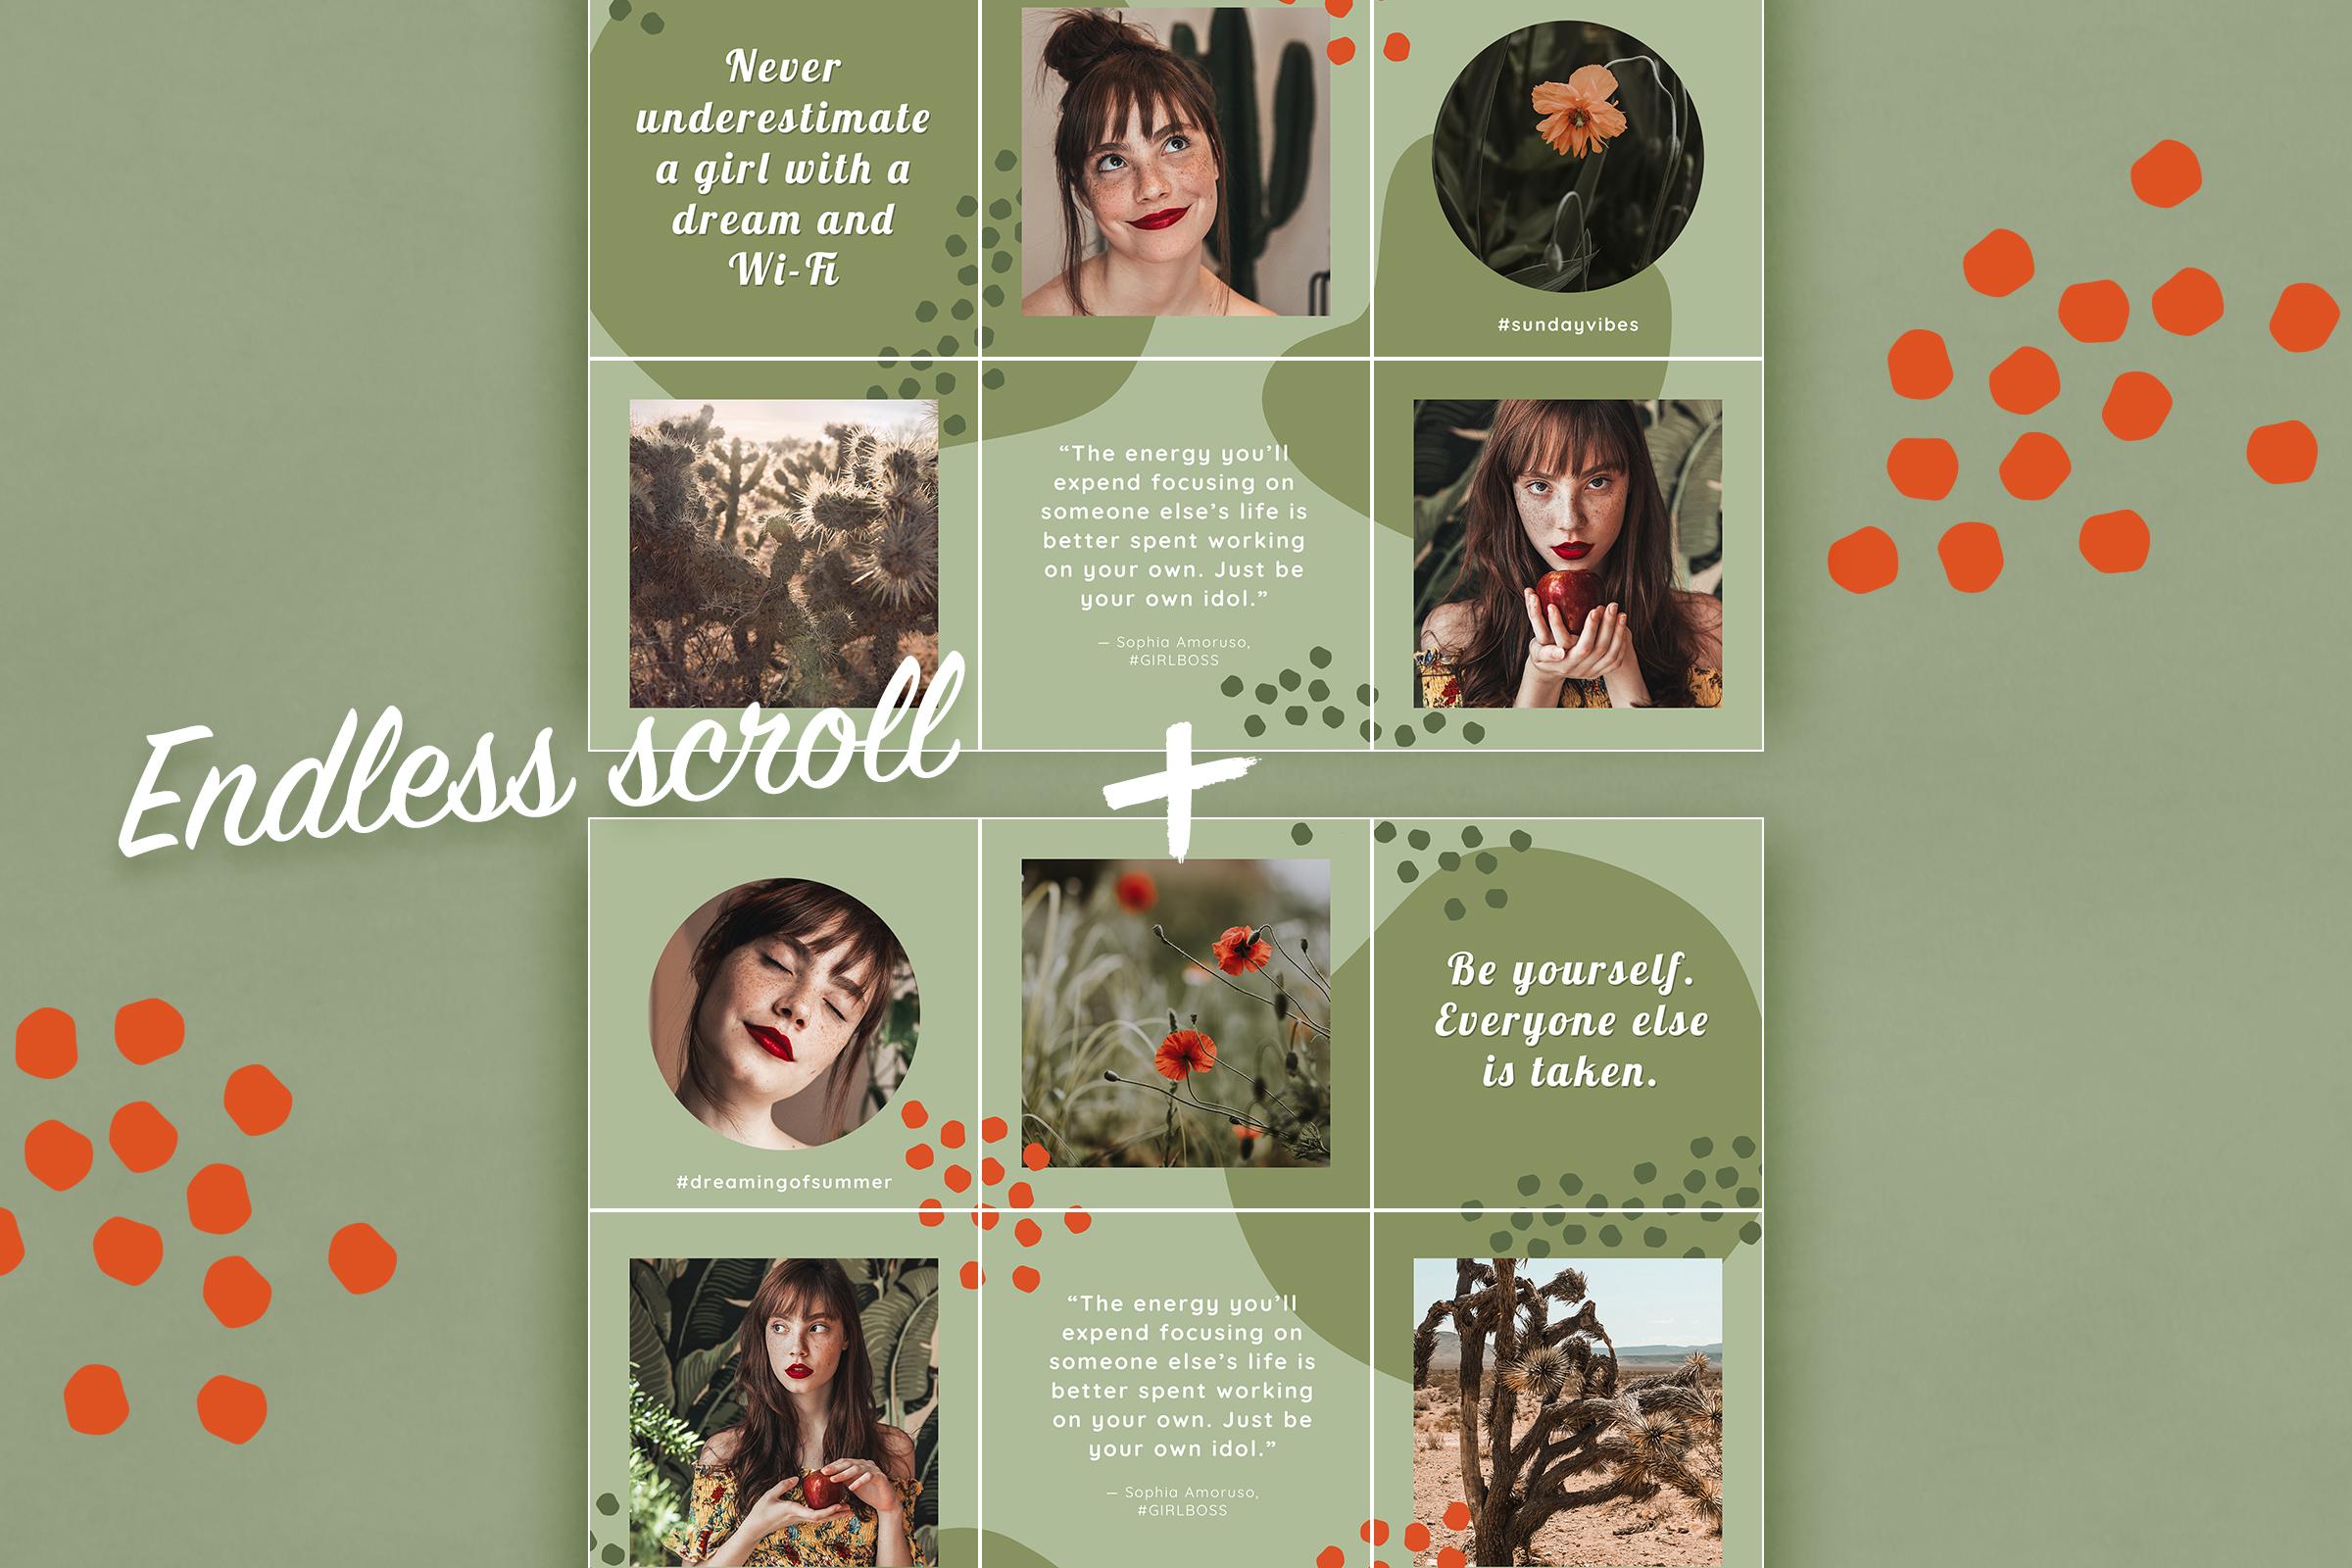 摄影照片朋友圈展示INS风模板图文排版PSD海报 Instagram Quotes Puzzle Template插图(6)